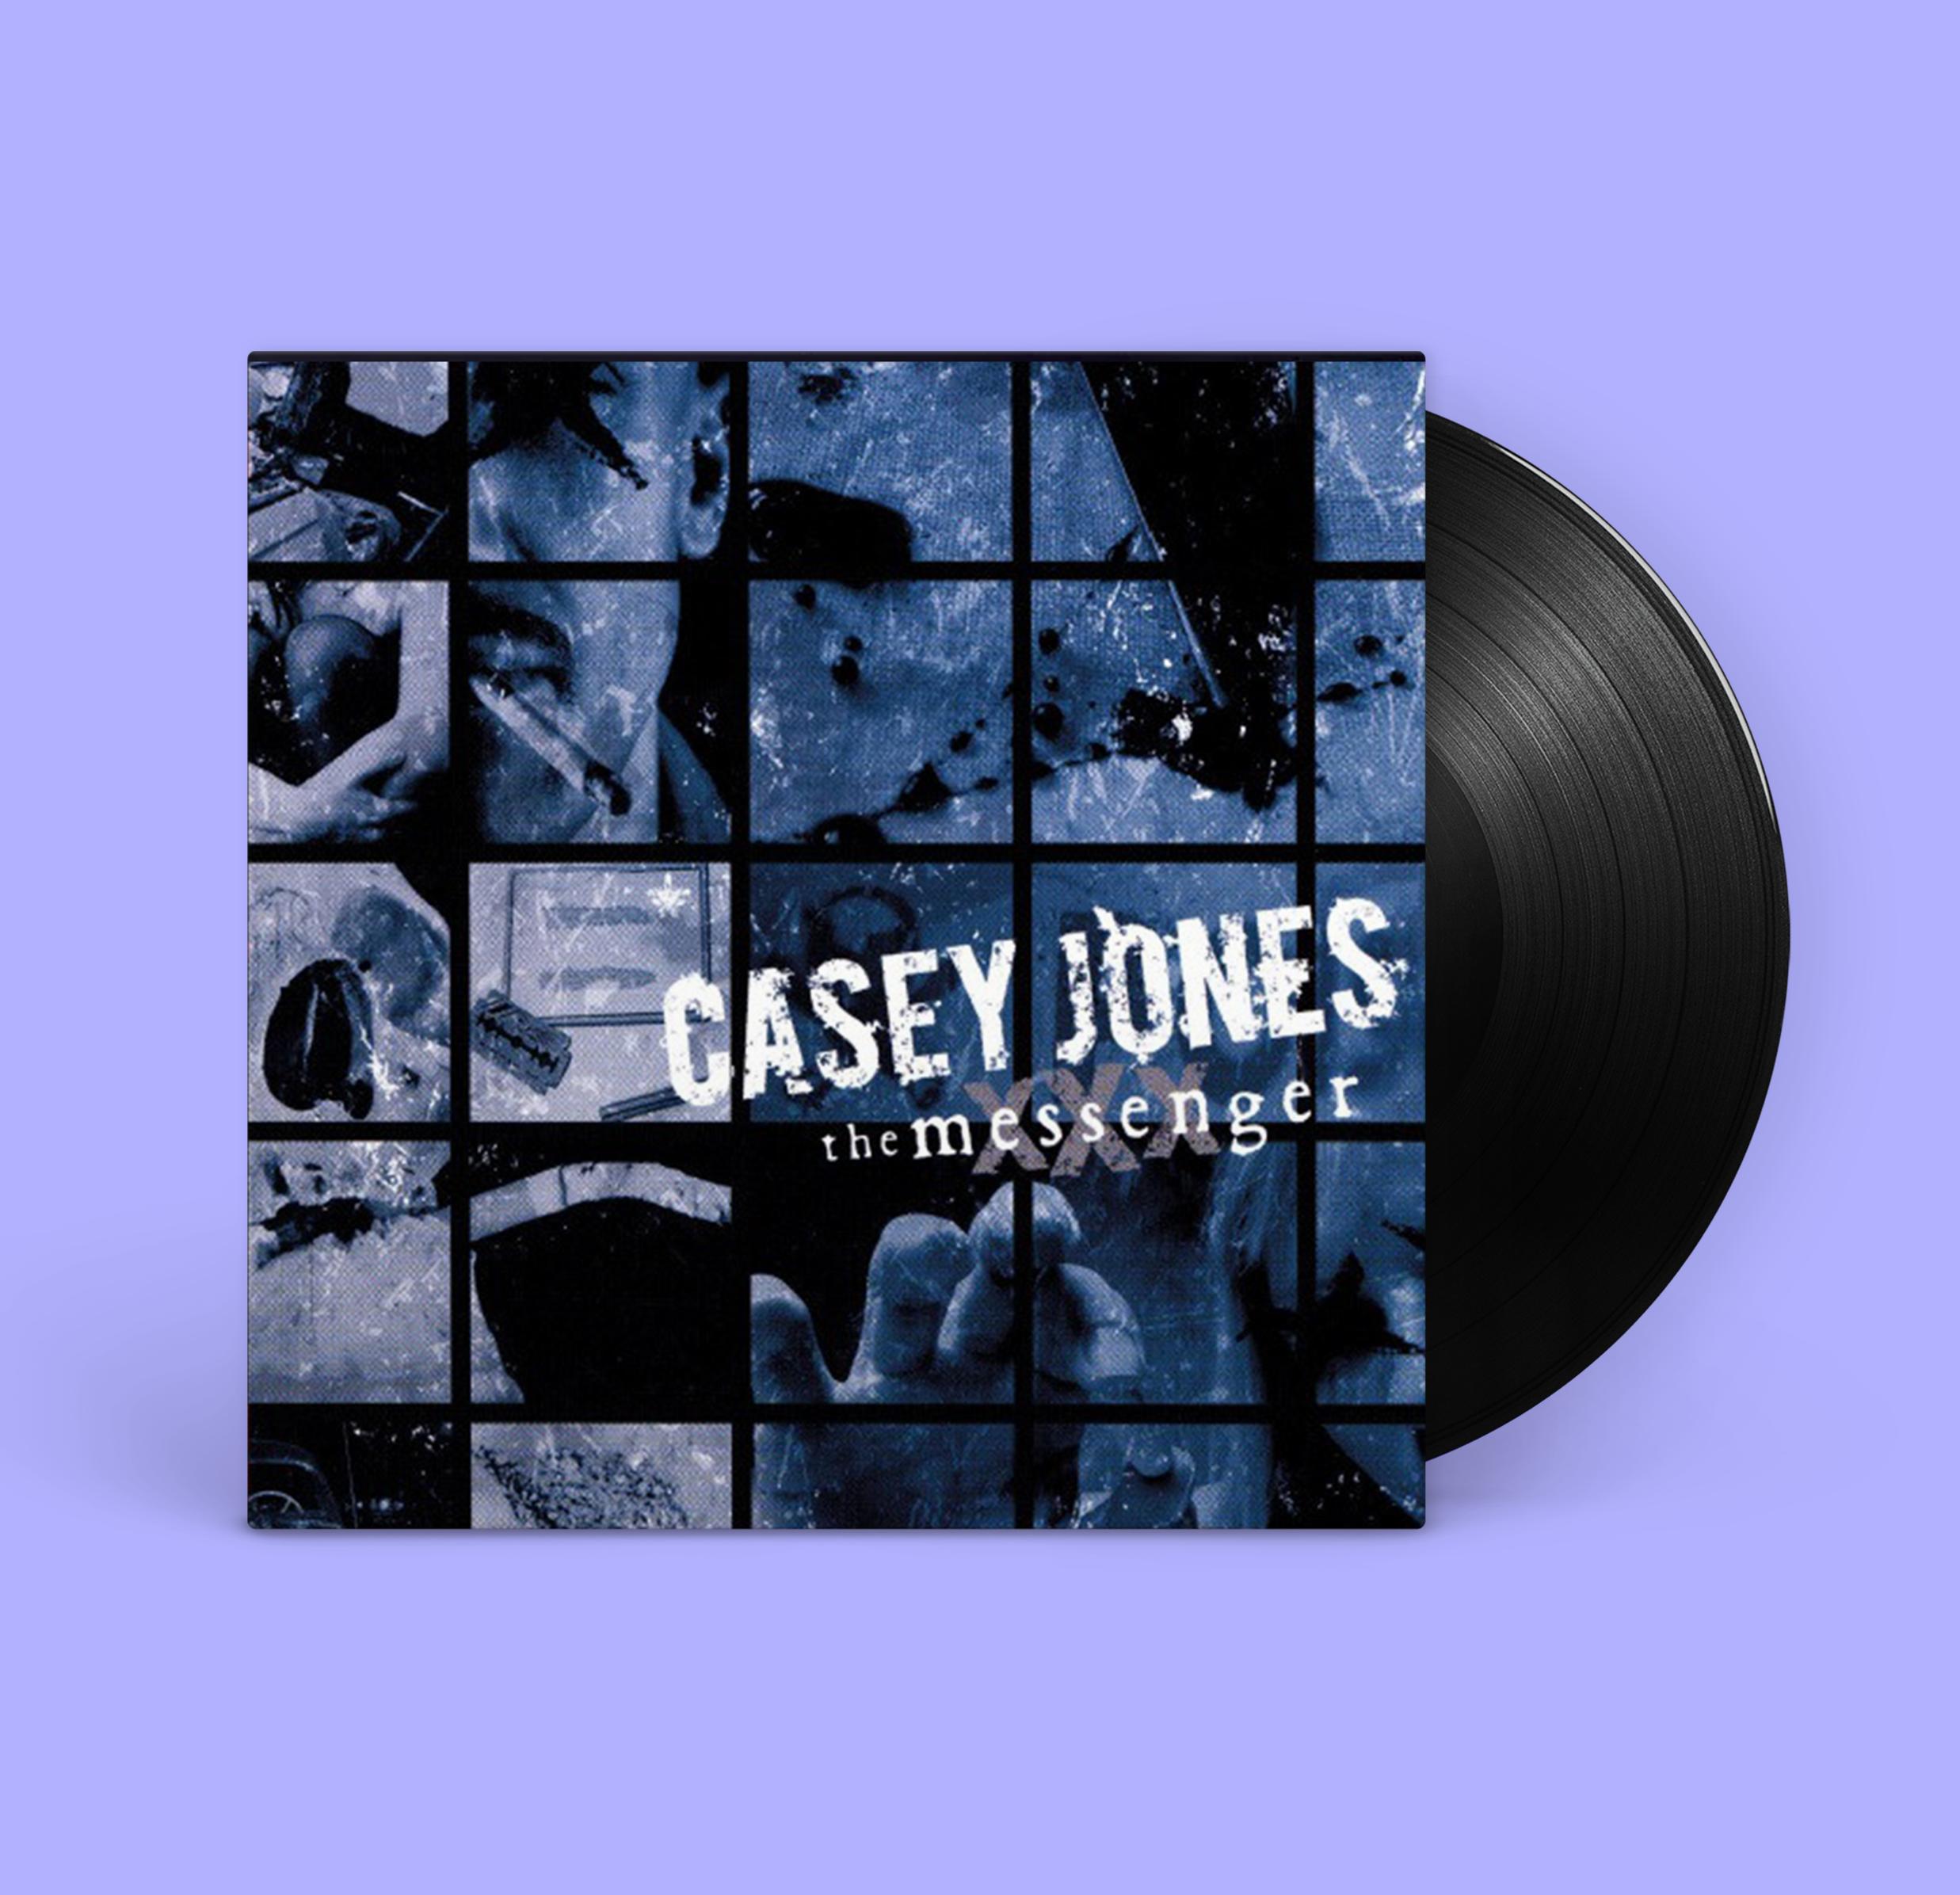 Casey Jones - The Messenger [LP, Vinyl, Black]